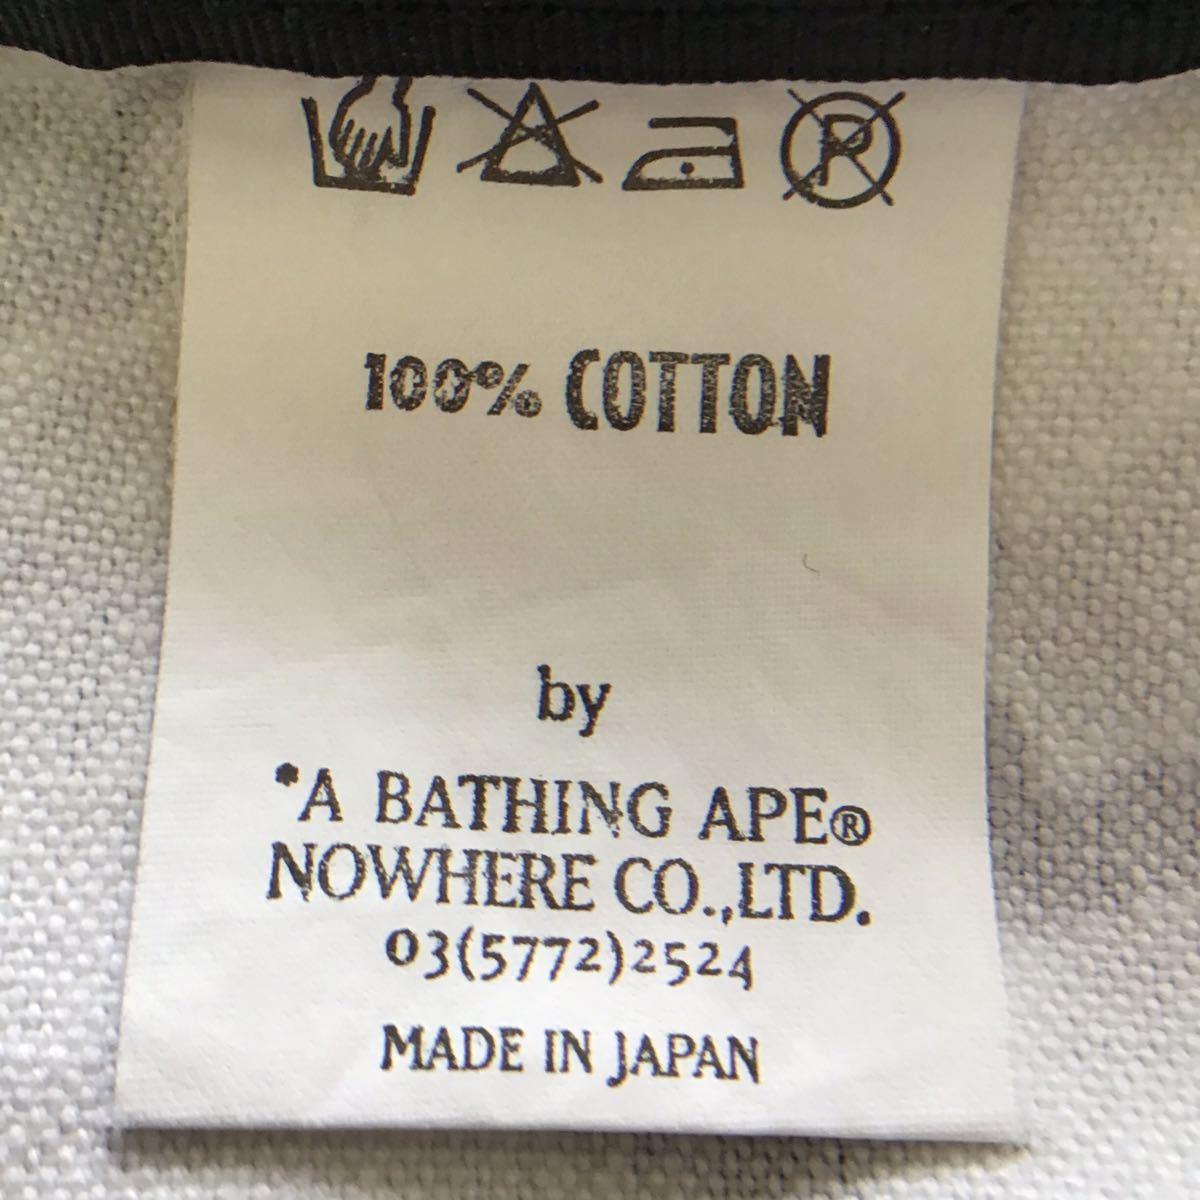 sta camo トート バッグ a bathing ape bape tote bag エイプ ベイプ アベイシングエイプ psyche camo サイケ 迷彩 nigo 1431